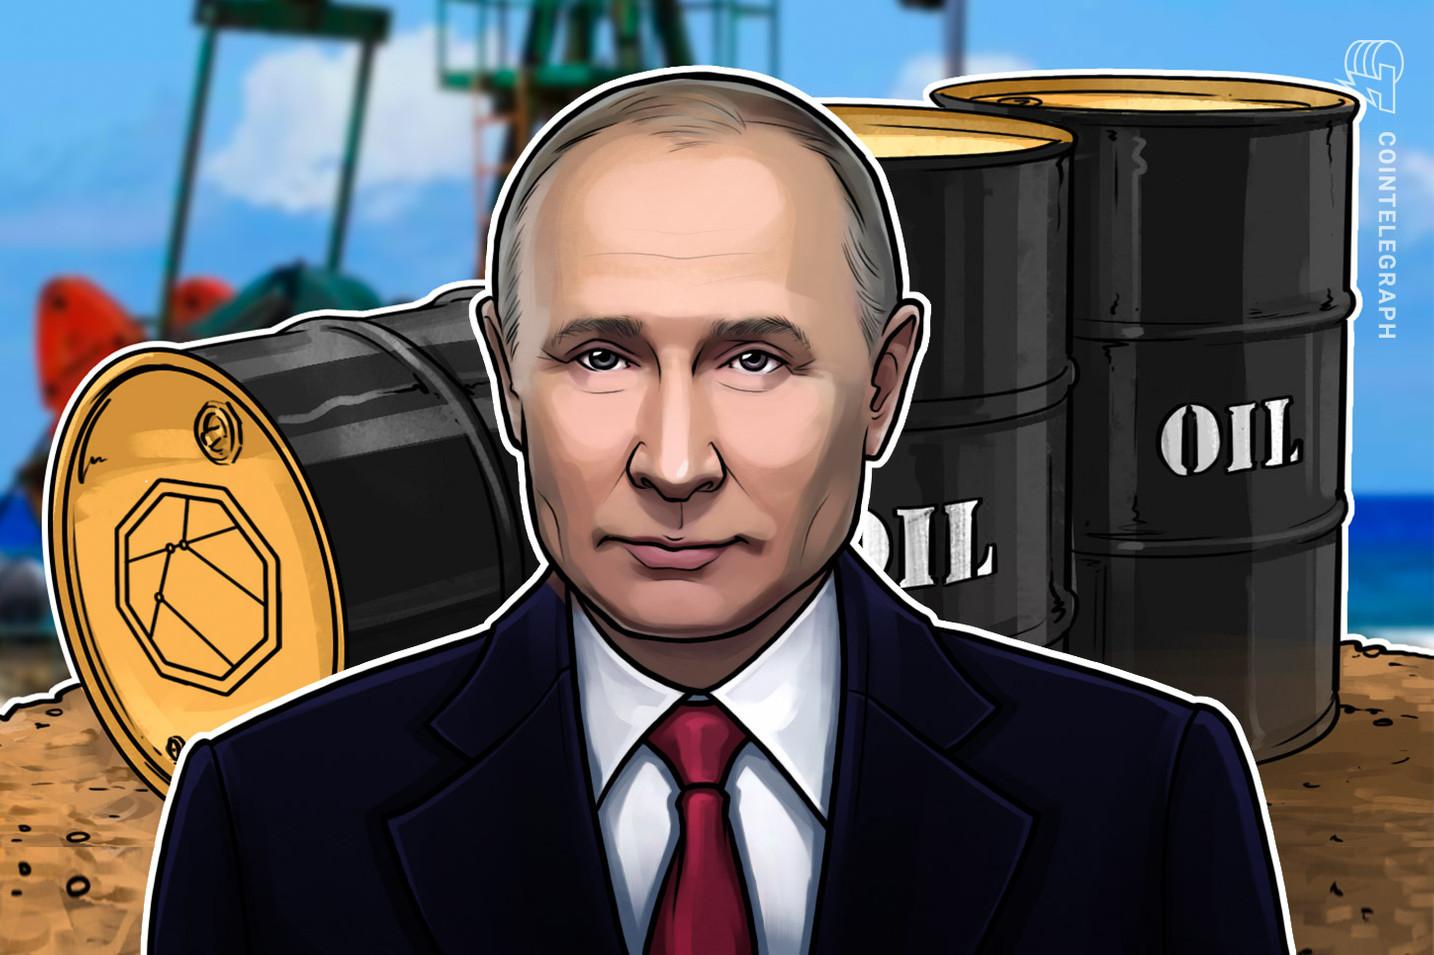 Too aboriginal  to speech   astir  utilizing crypto for lipid  trading, says Putin